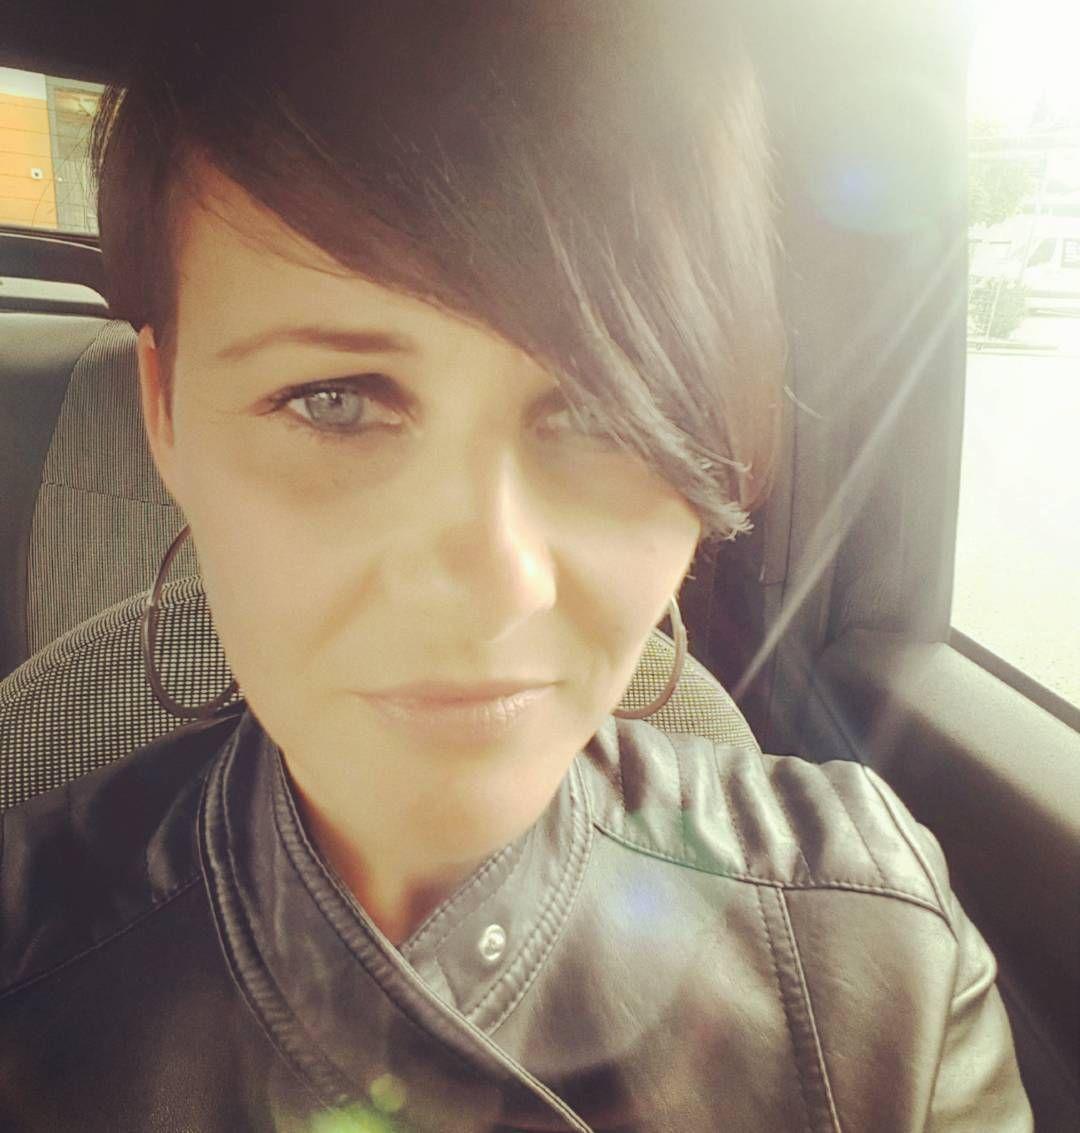 #selfie#me#inthecar#josephine#wednesday http://misstagram.com/ipost/1612964806239709897/?code=BZiZvIHH-rJ